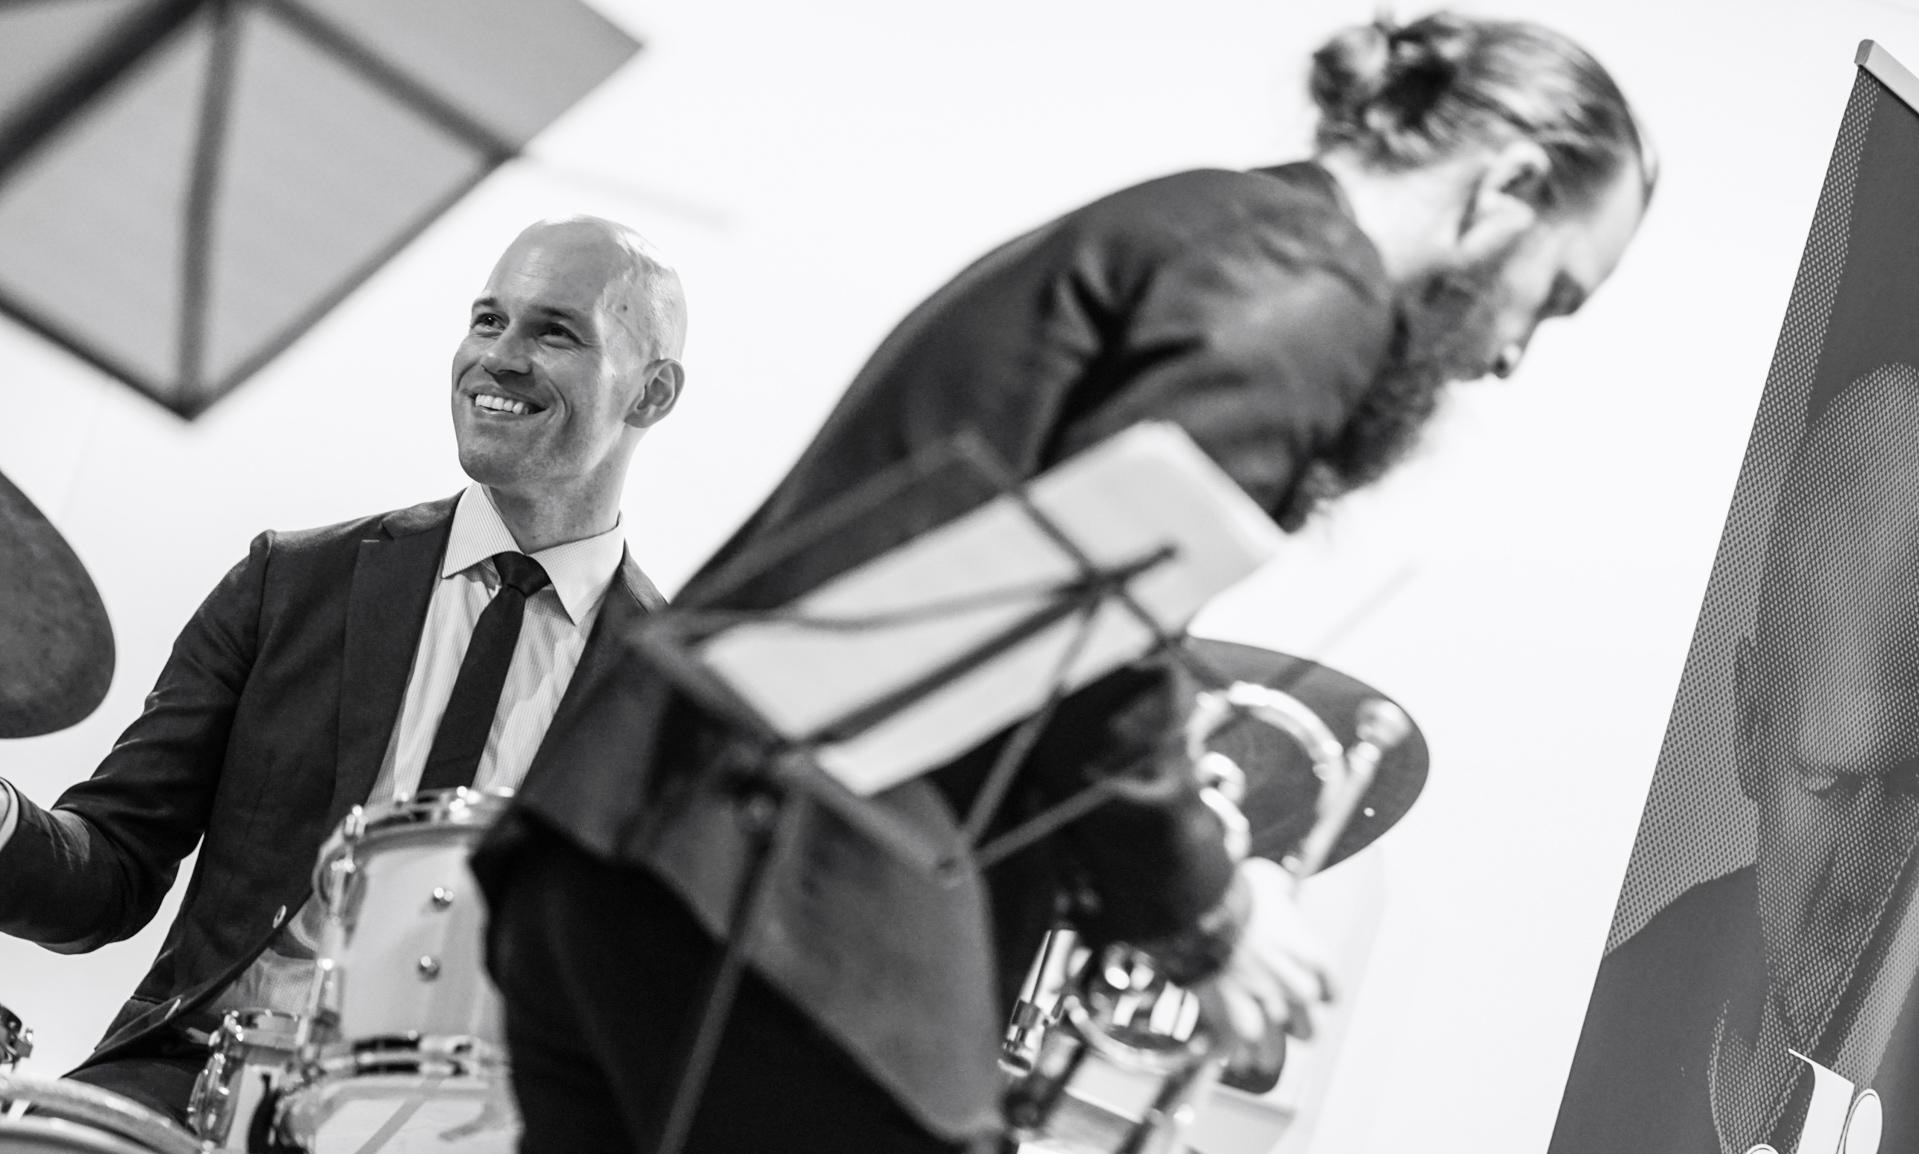 Fylder 50 år:Jazzselskabet Aarhus' jubilæumsår og nytårskur